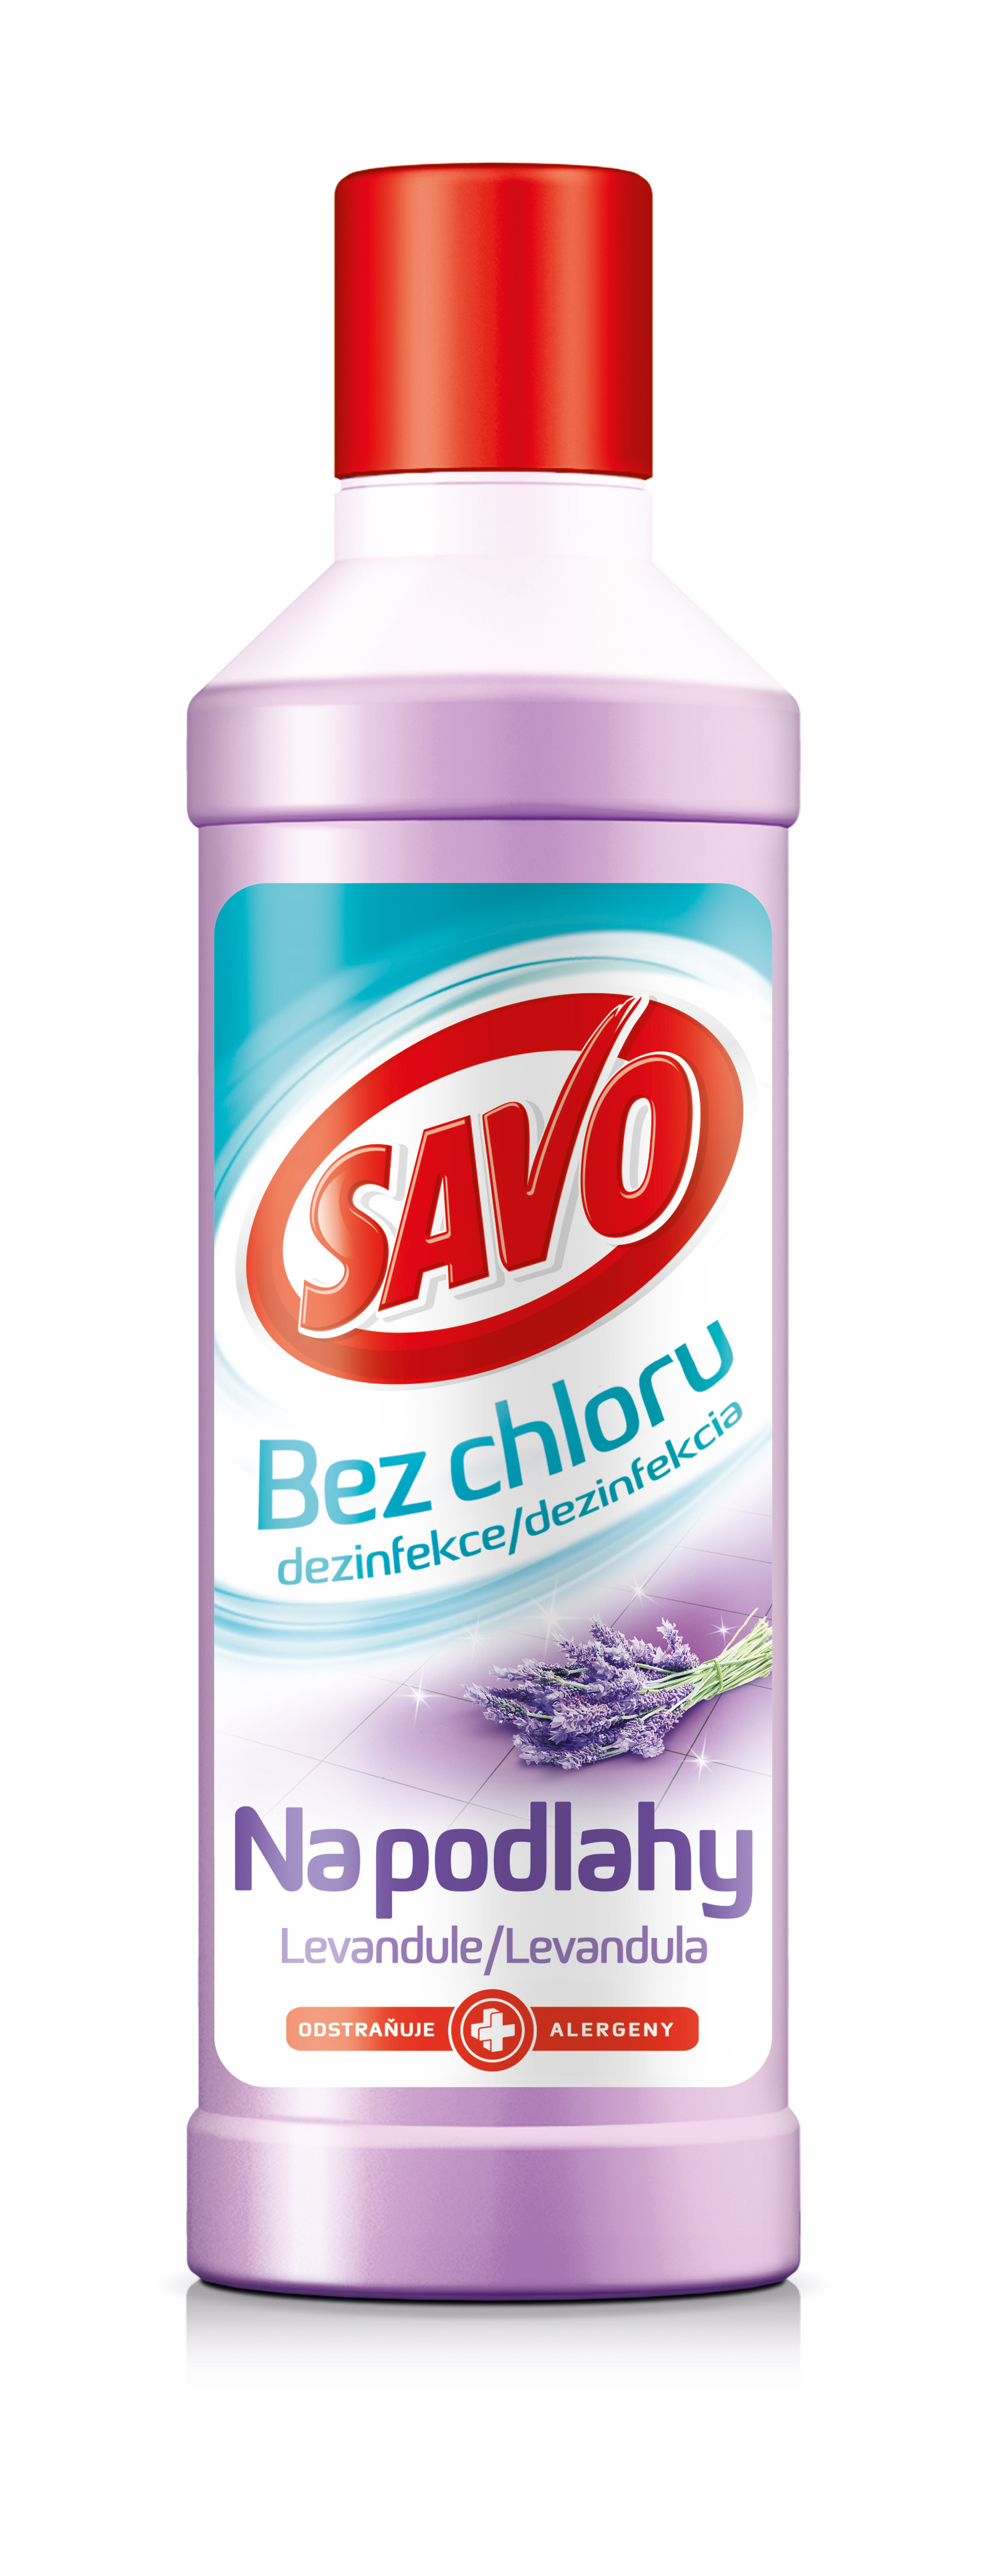 Savo bez chloru podlahy Levandule 1l